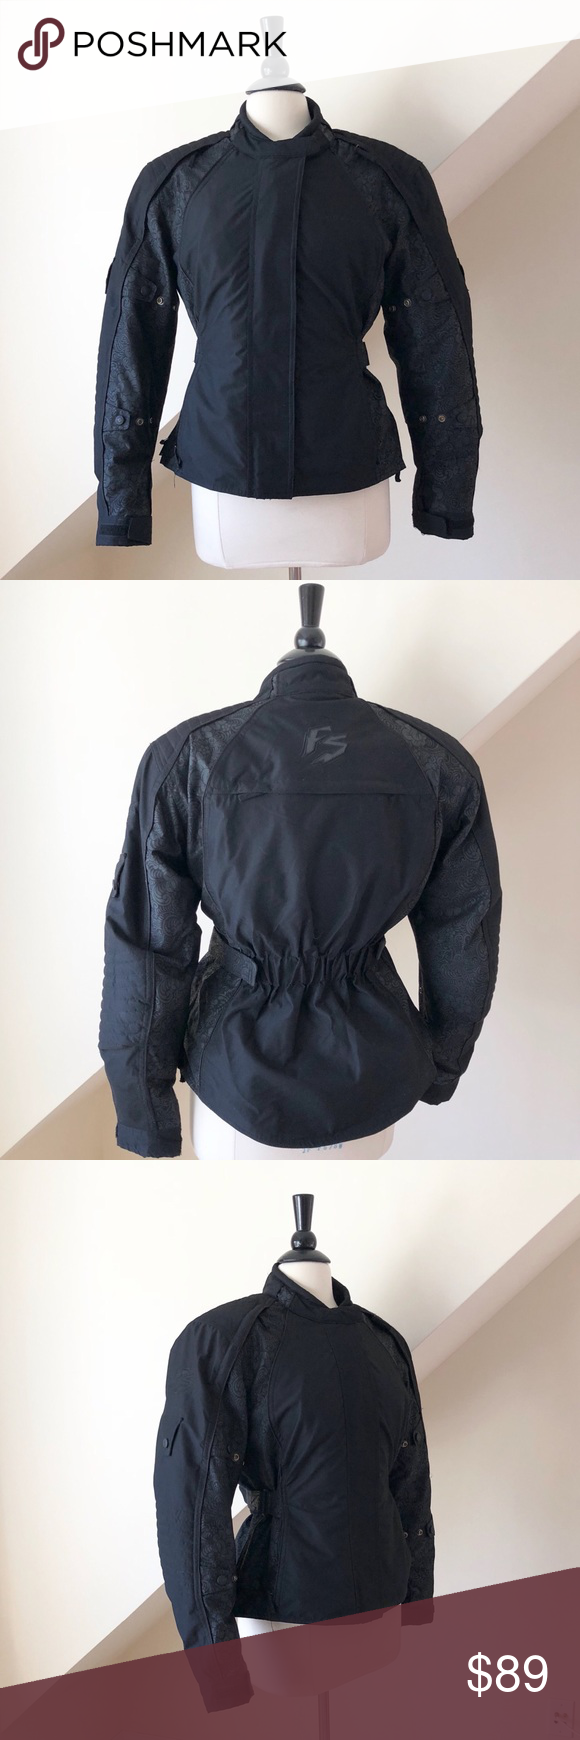 Like new! Fieldsheer Motorcycle Jacket Motorcycle jacket